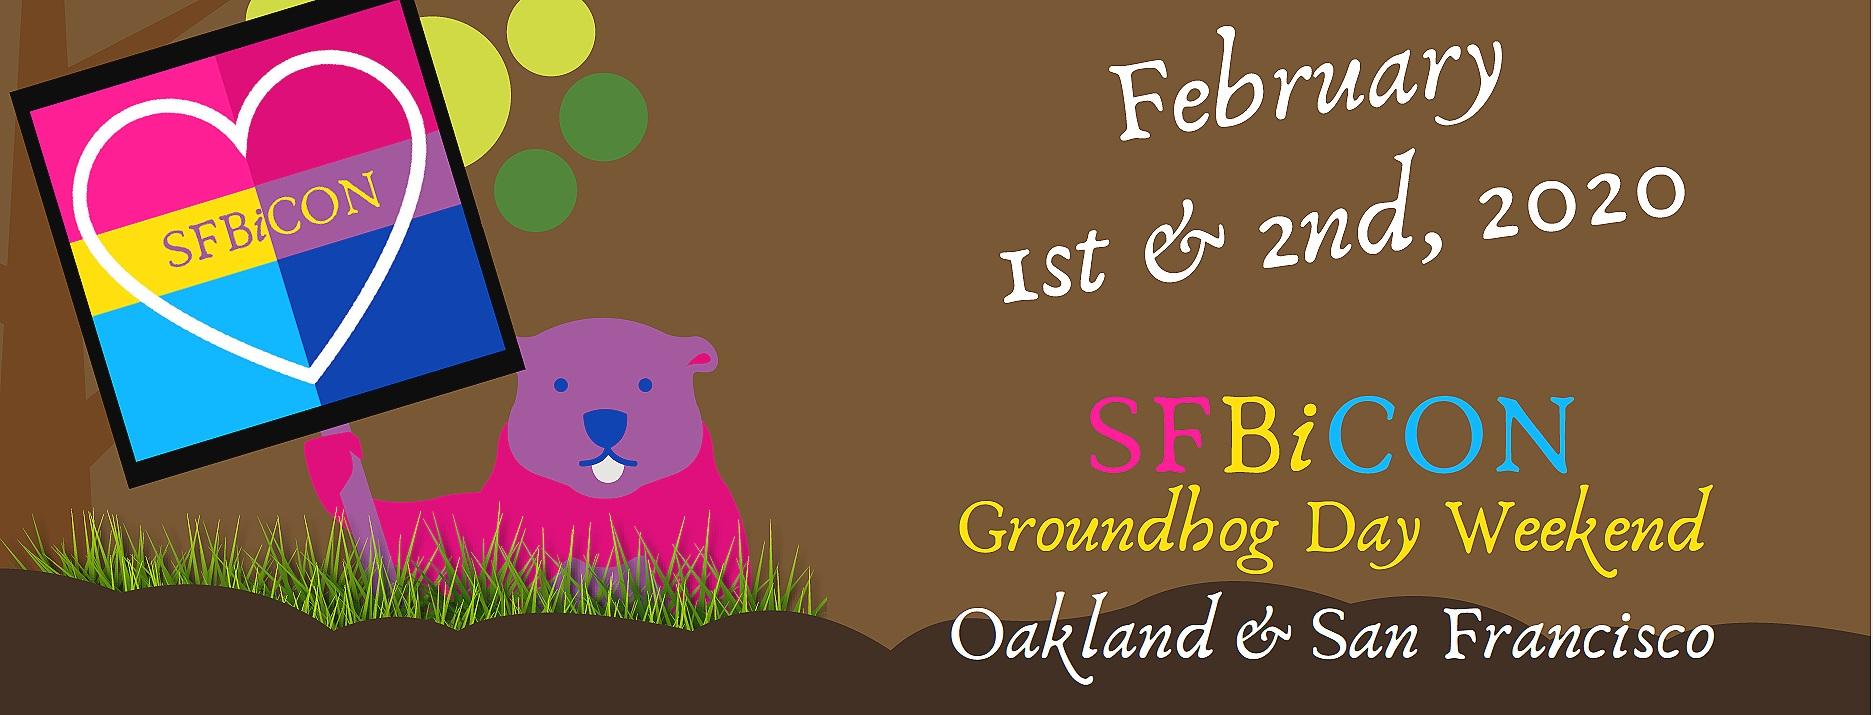 Feb1and2groundhog.jpg